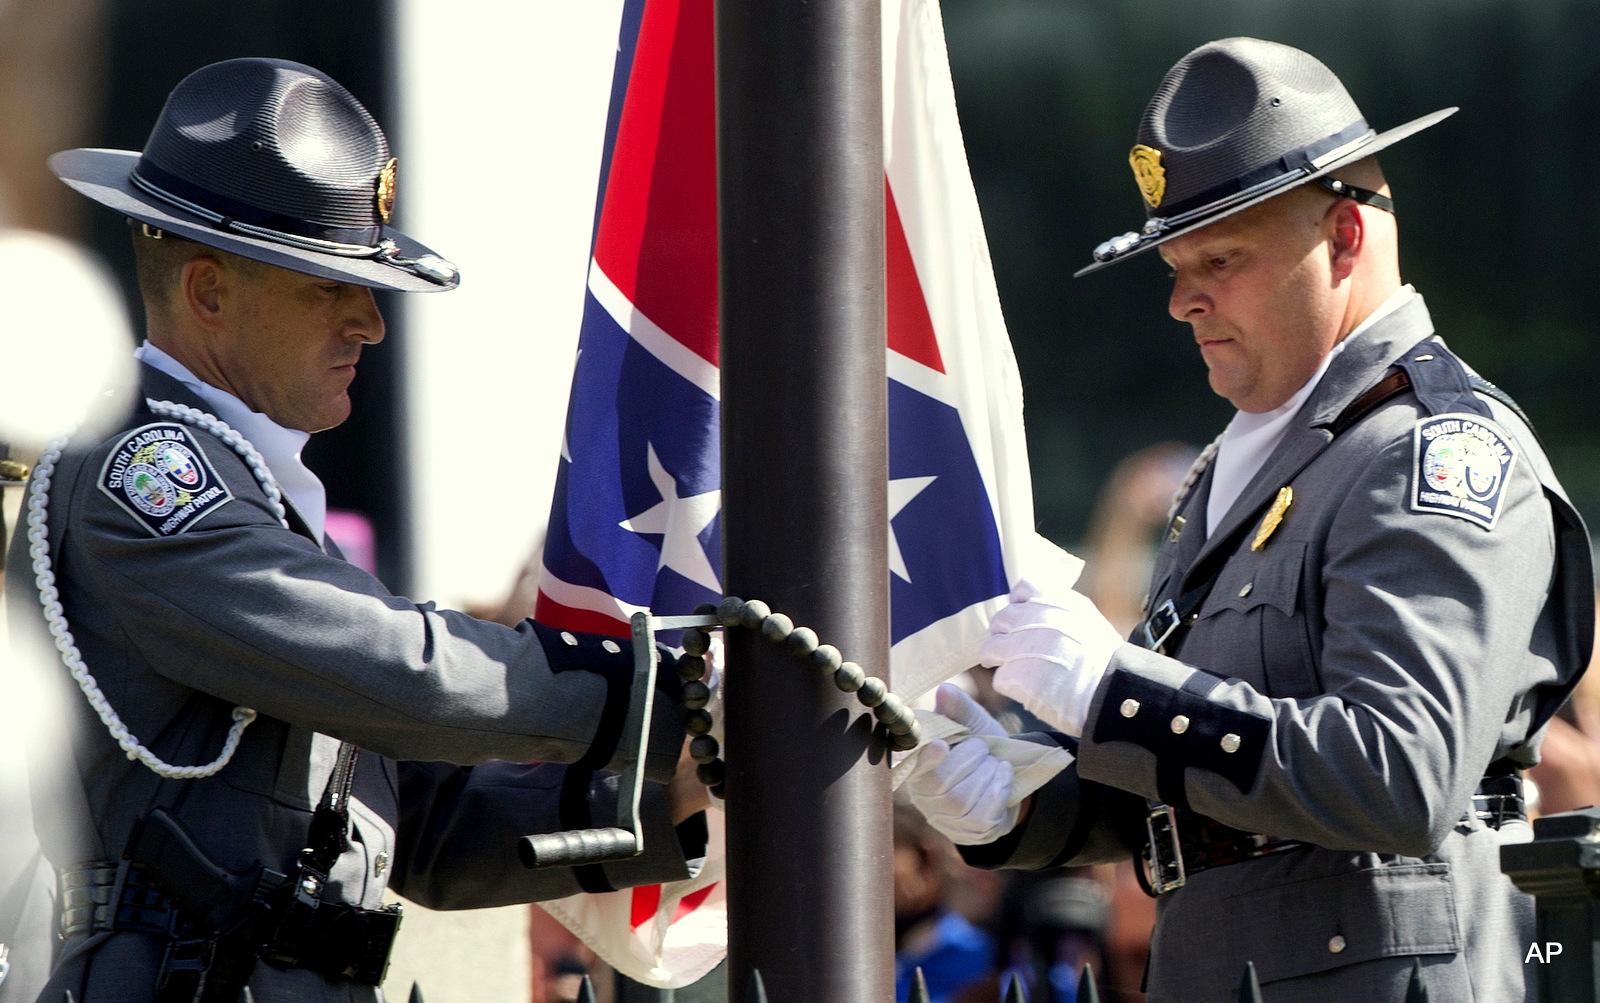 ConfederateFlagRemoved71115.jpg